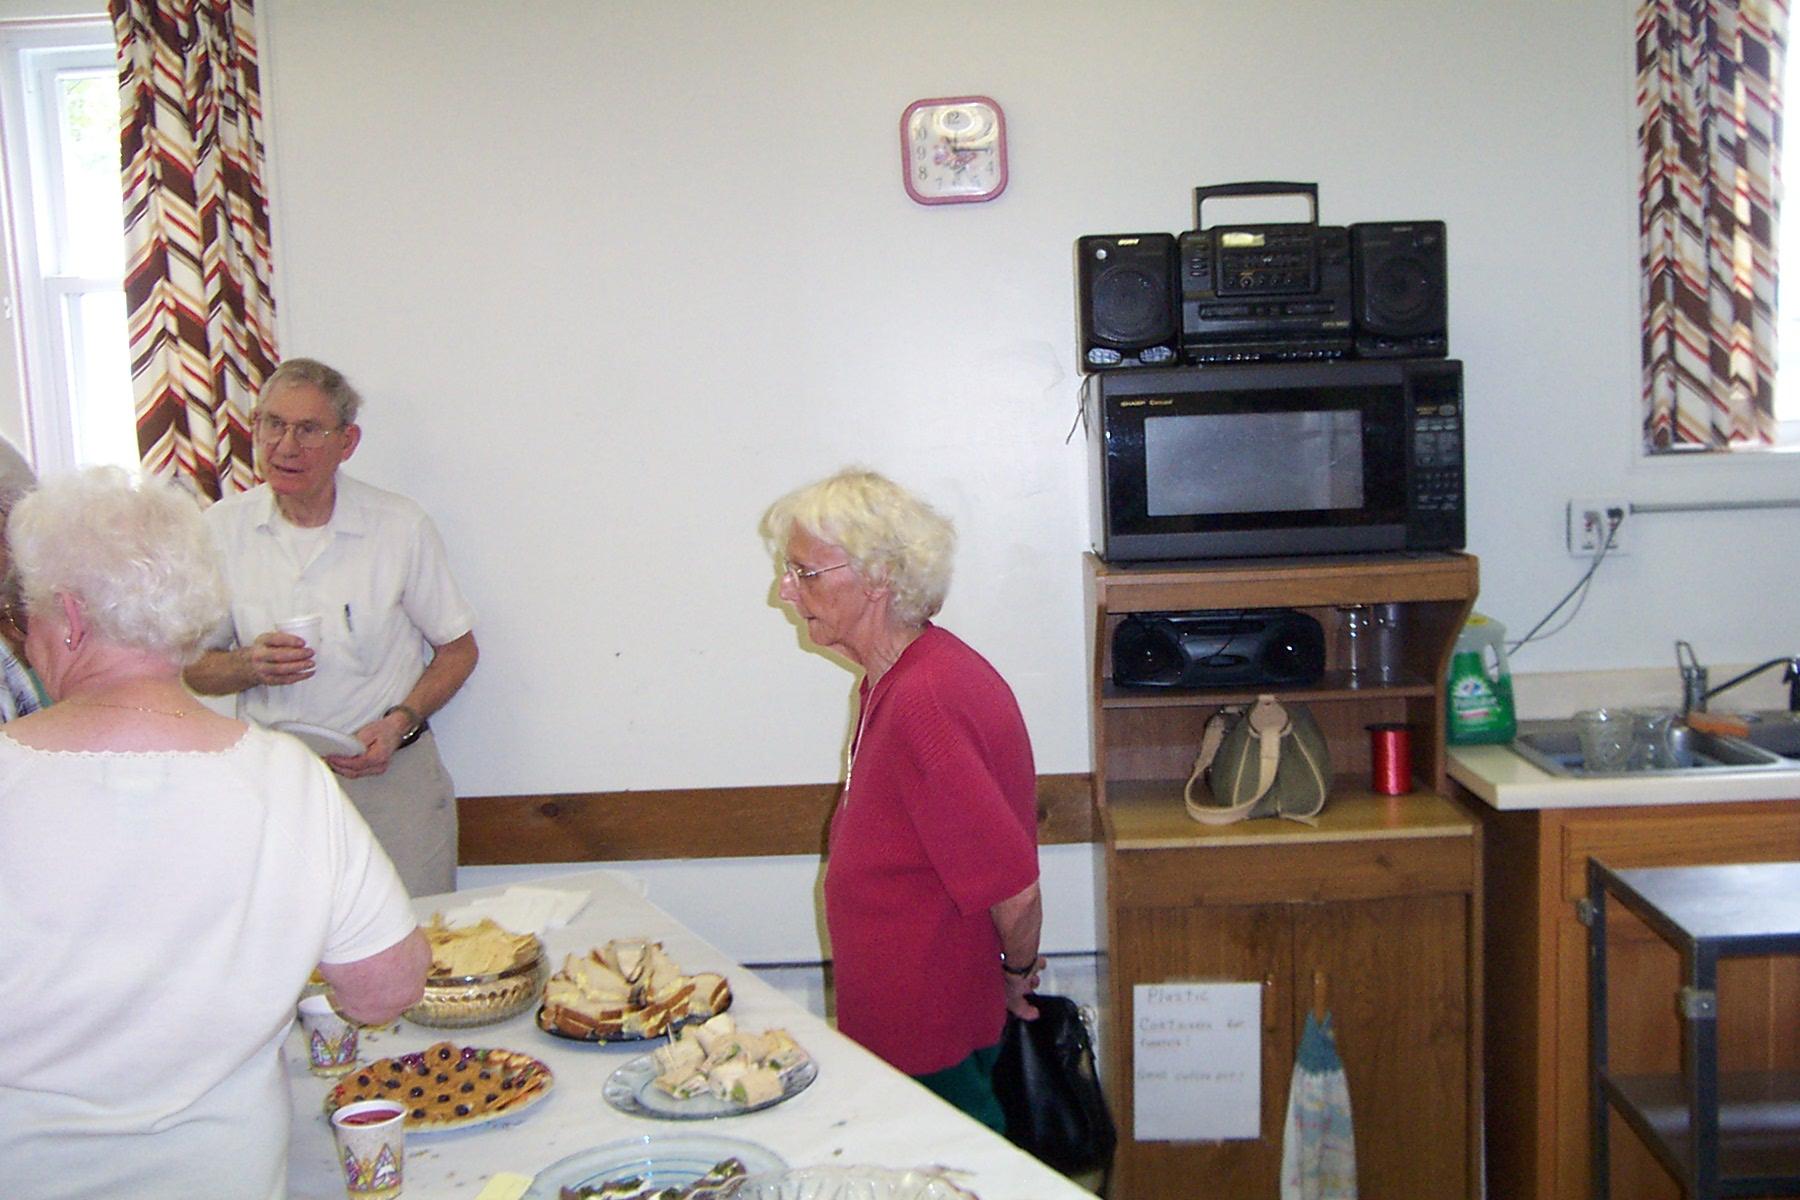 Theresa Raymond & Bill Meisenzahl - 2008-06-29 021